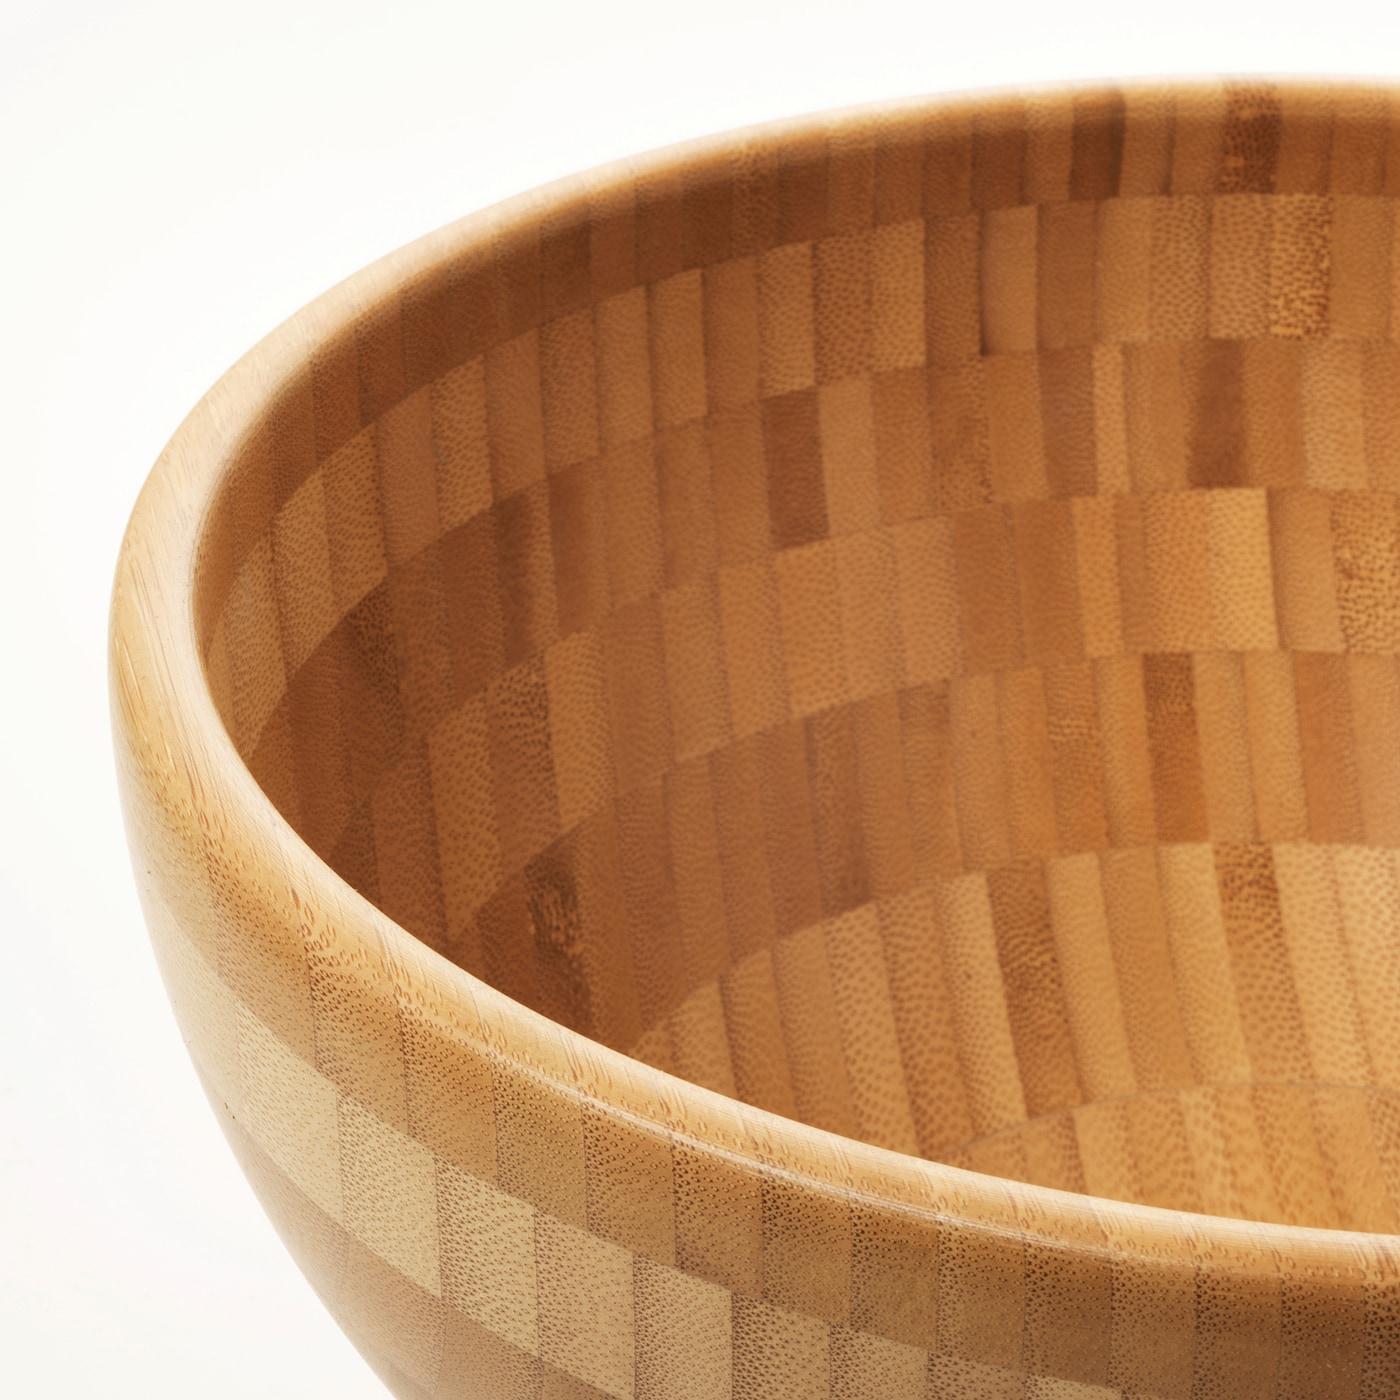 Bamboo ~ Ikea Blanda Matt ~ 5 Salad Serving Bowl